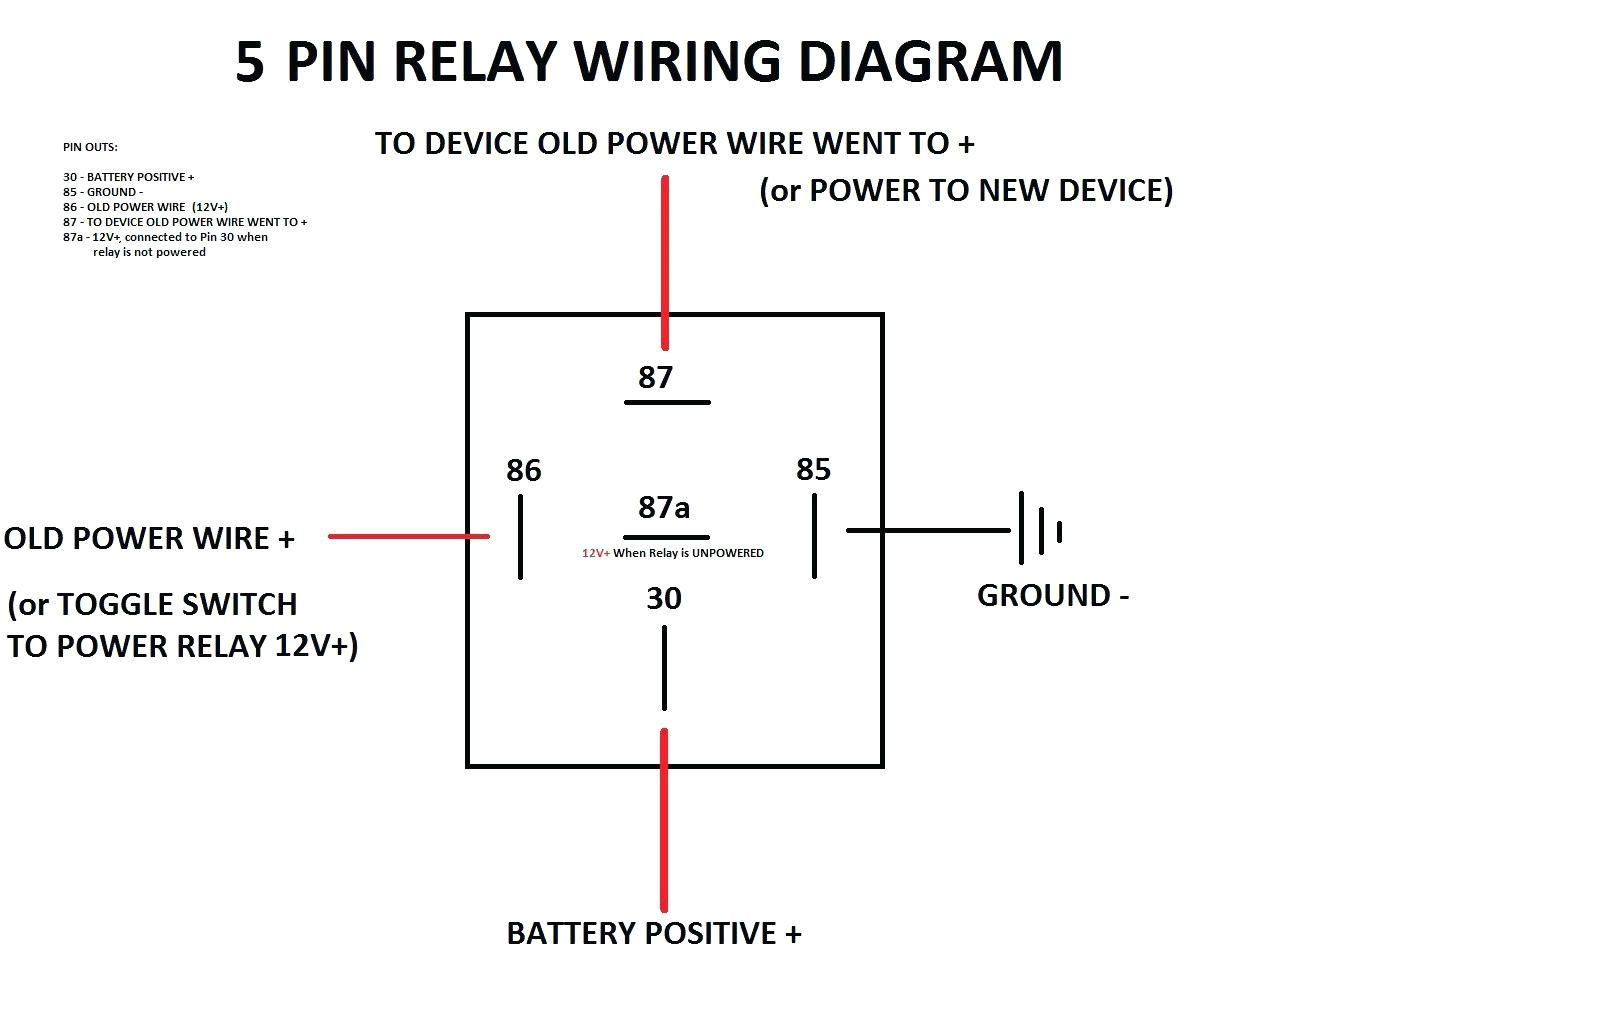 automotive wiring relays diagram wiring diagram paper dpst automotive relay diagram wiring diagram used automotive wiring